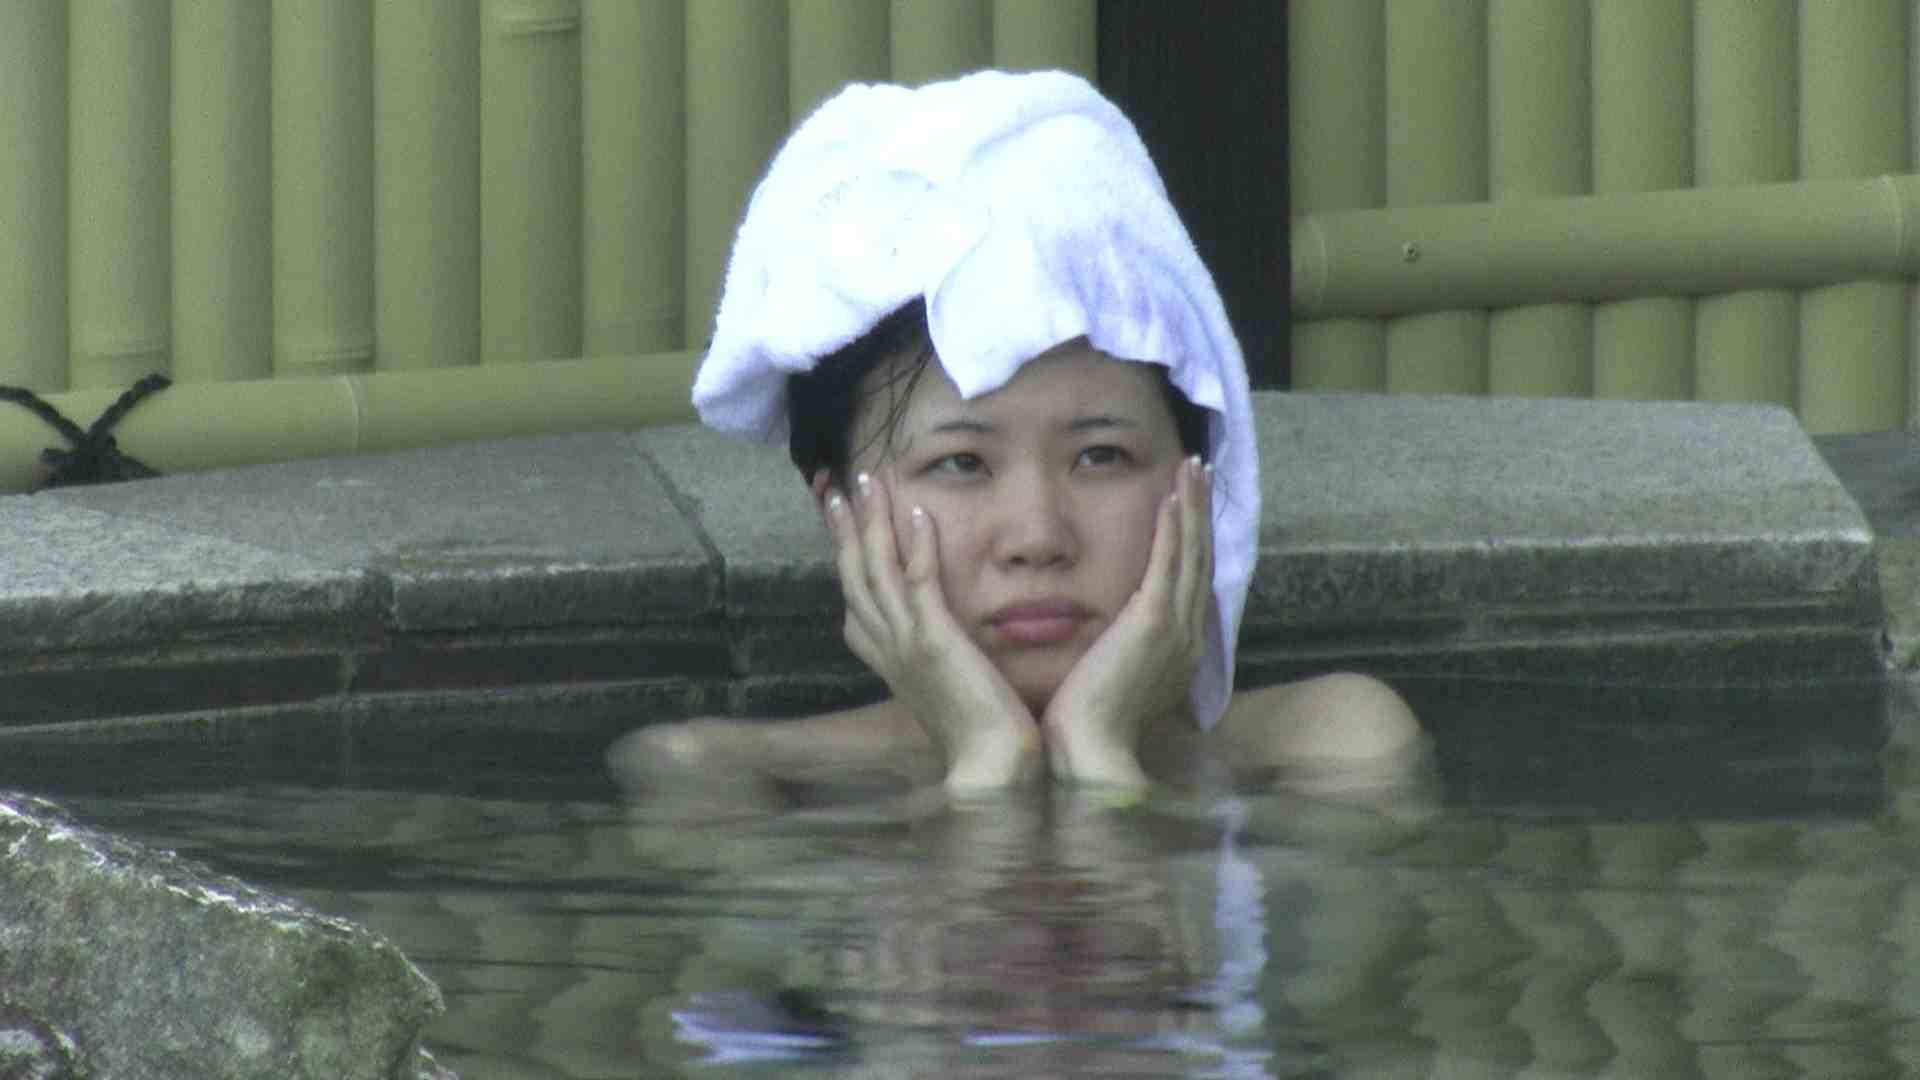 Aquaな露天風呂Vol.183 盗撮師作品 エロ無料画像 105pic 95